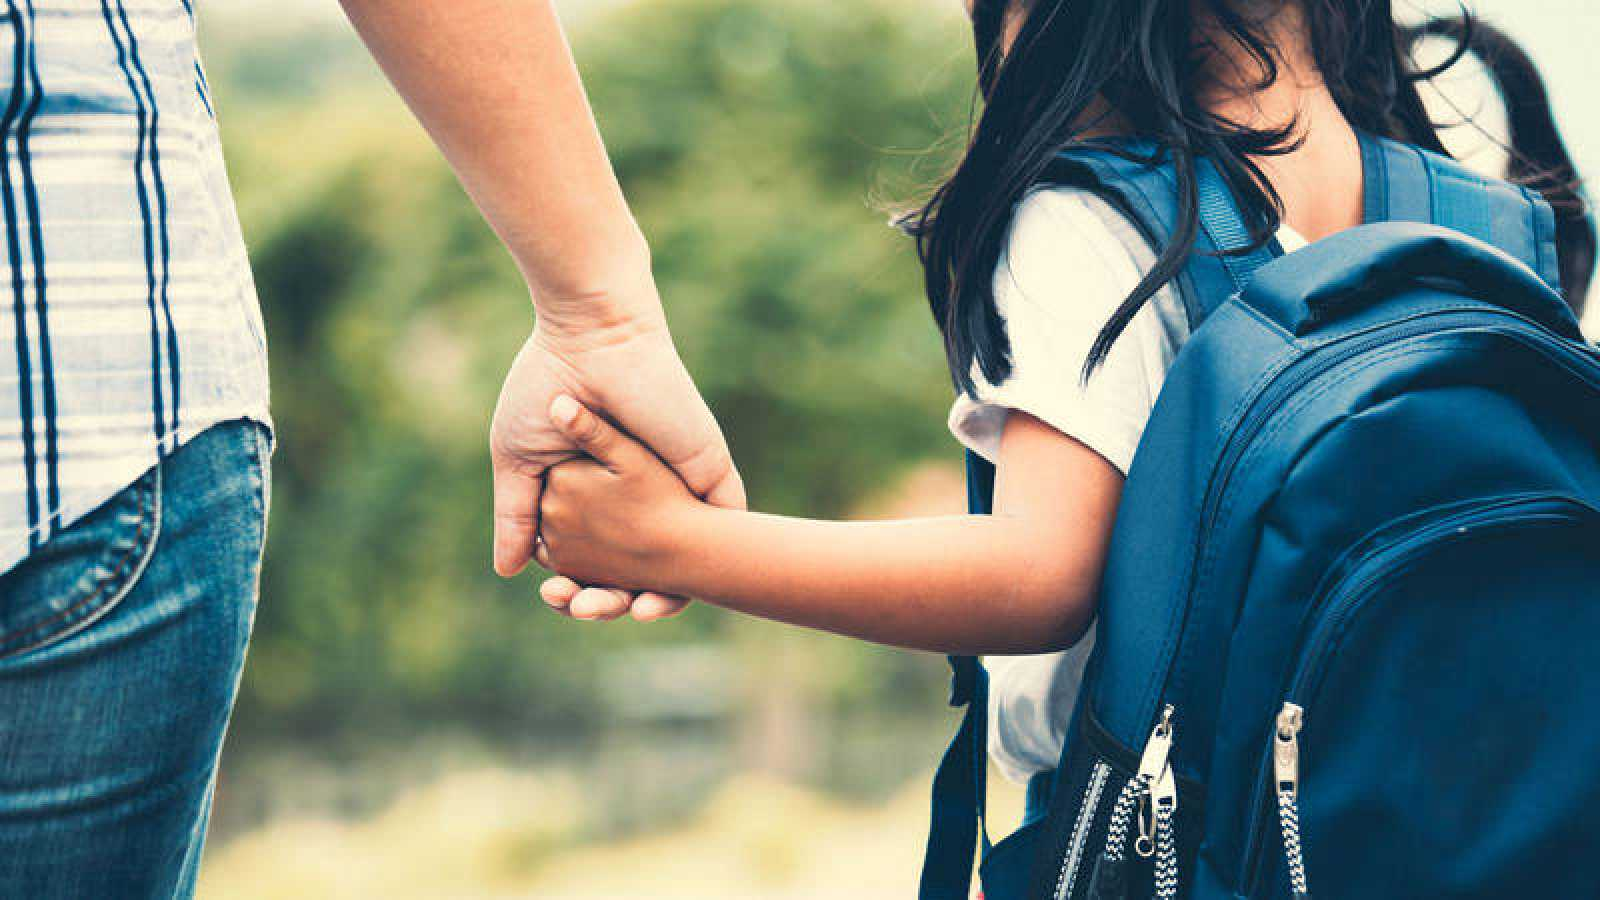 Una madre da la mano a su hija al salir del colegio